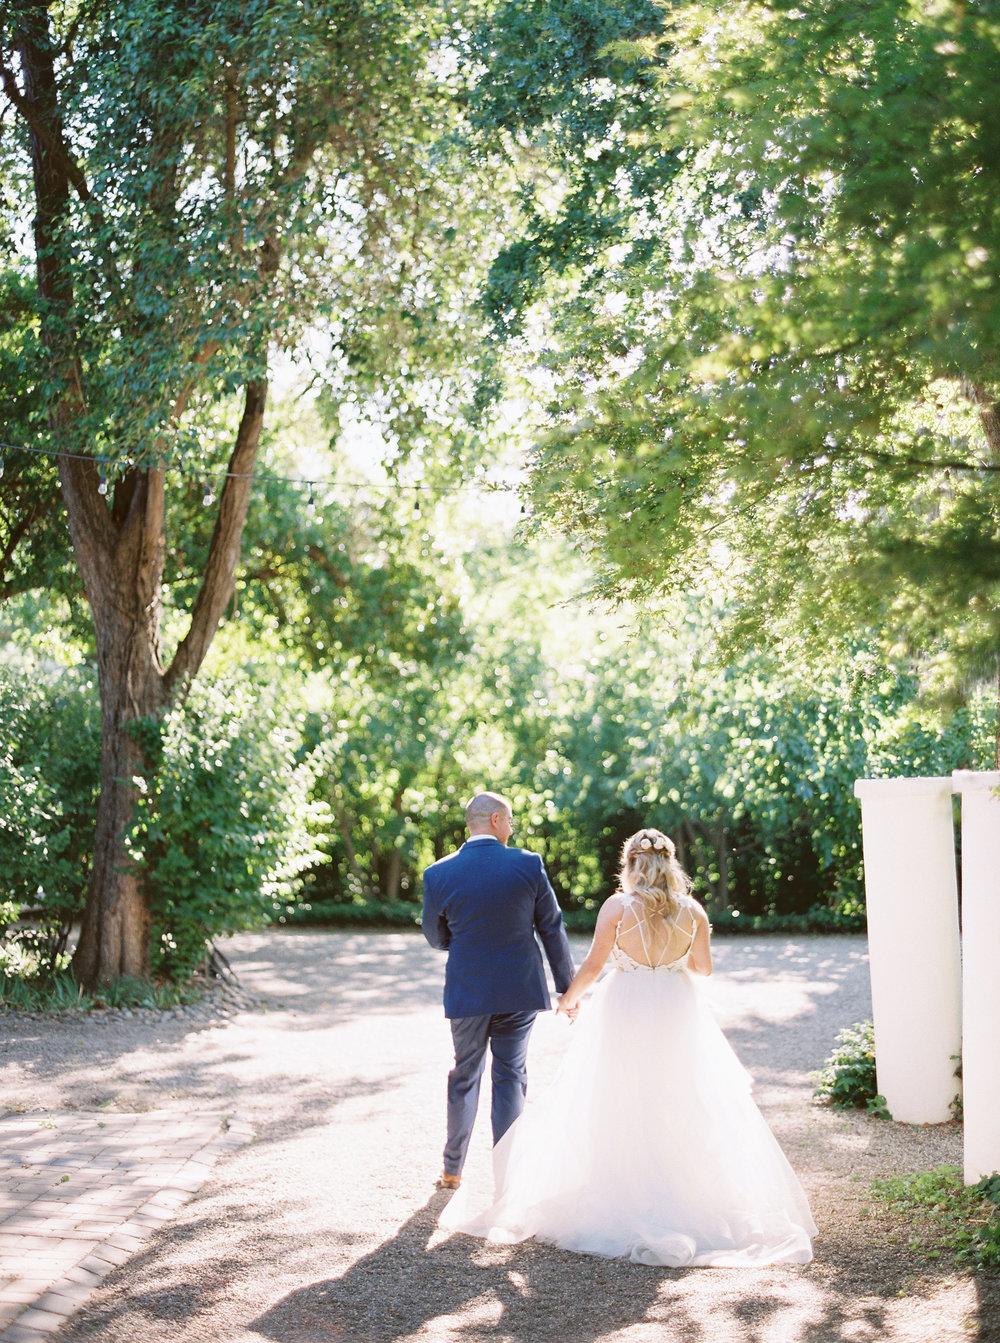 Durst-winery-wedding-in-lodi-calfornia-124.jpg